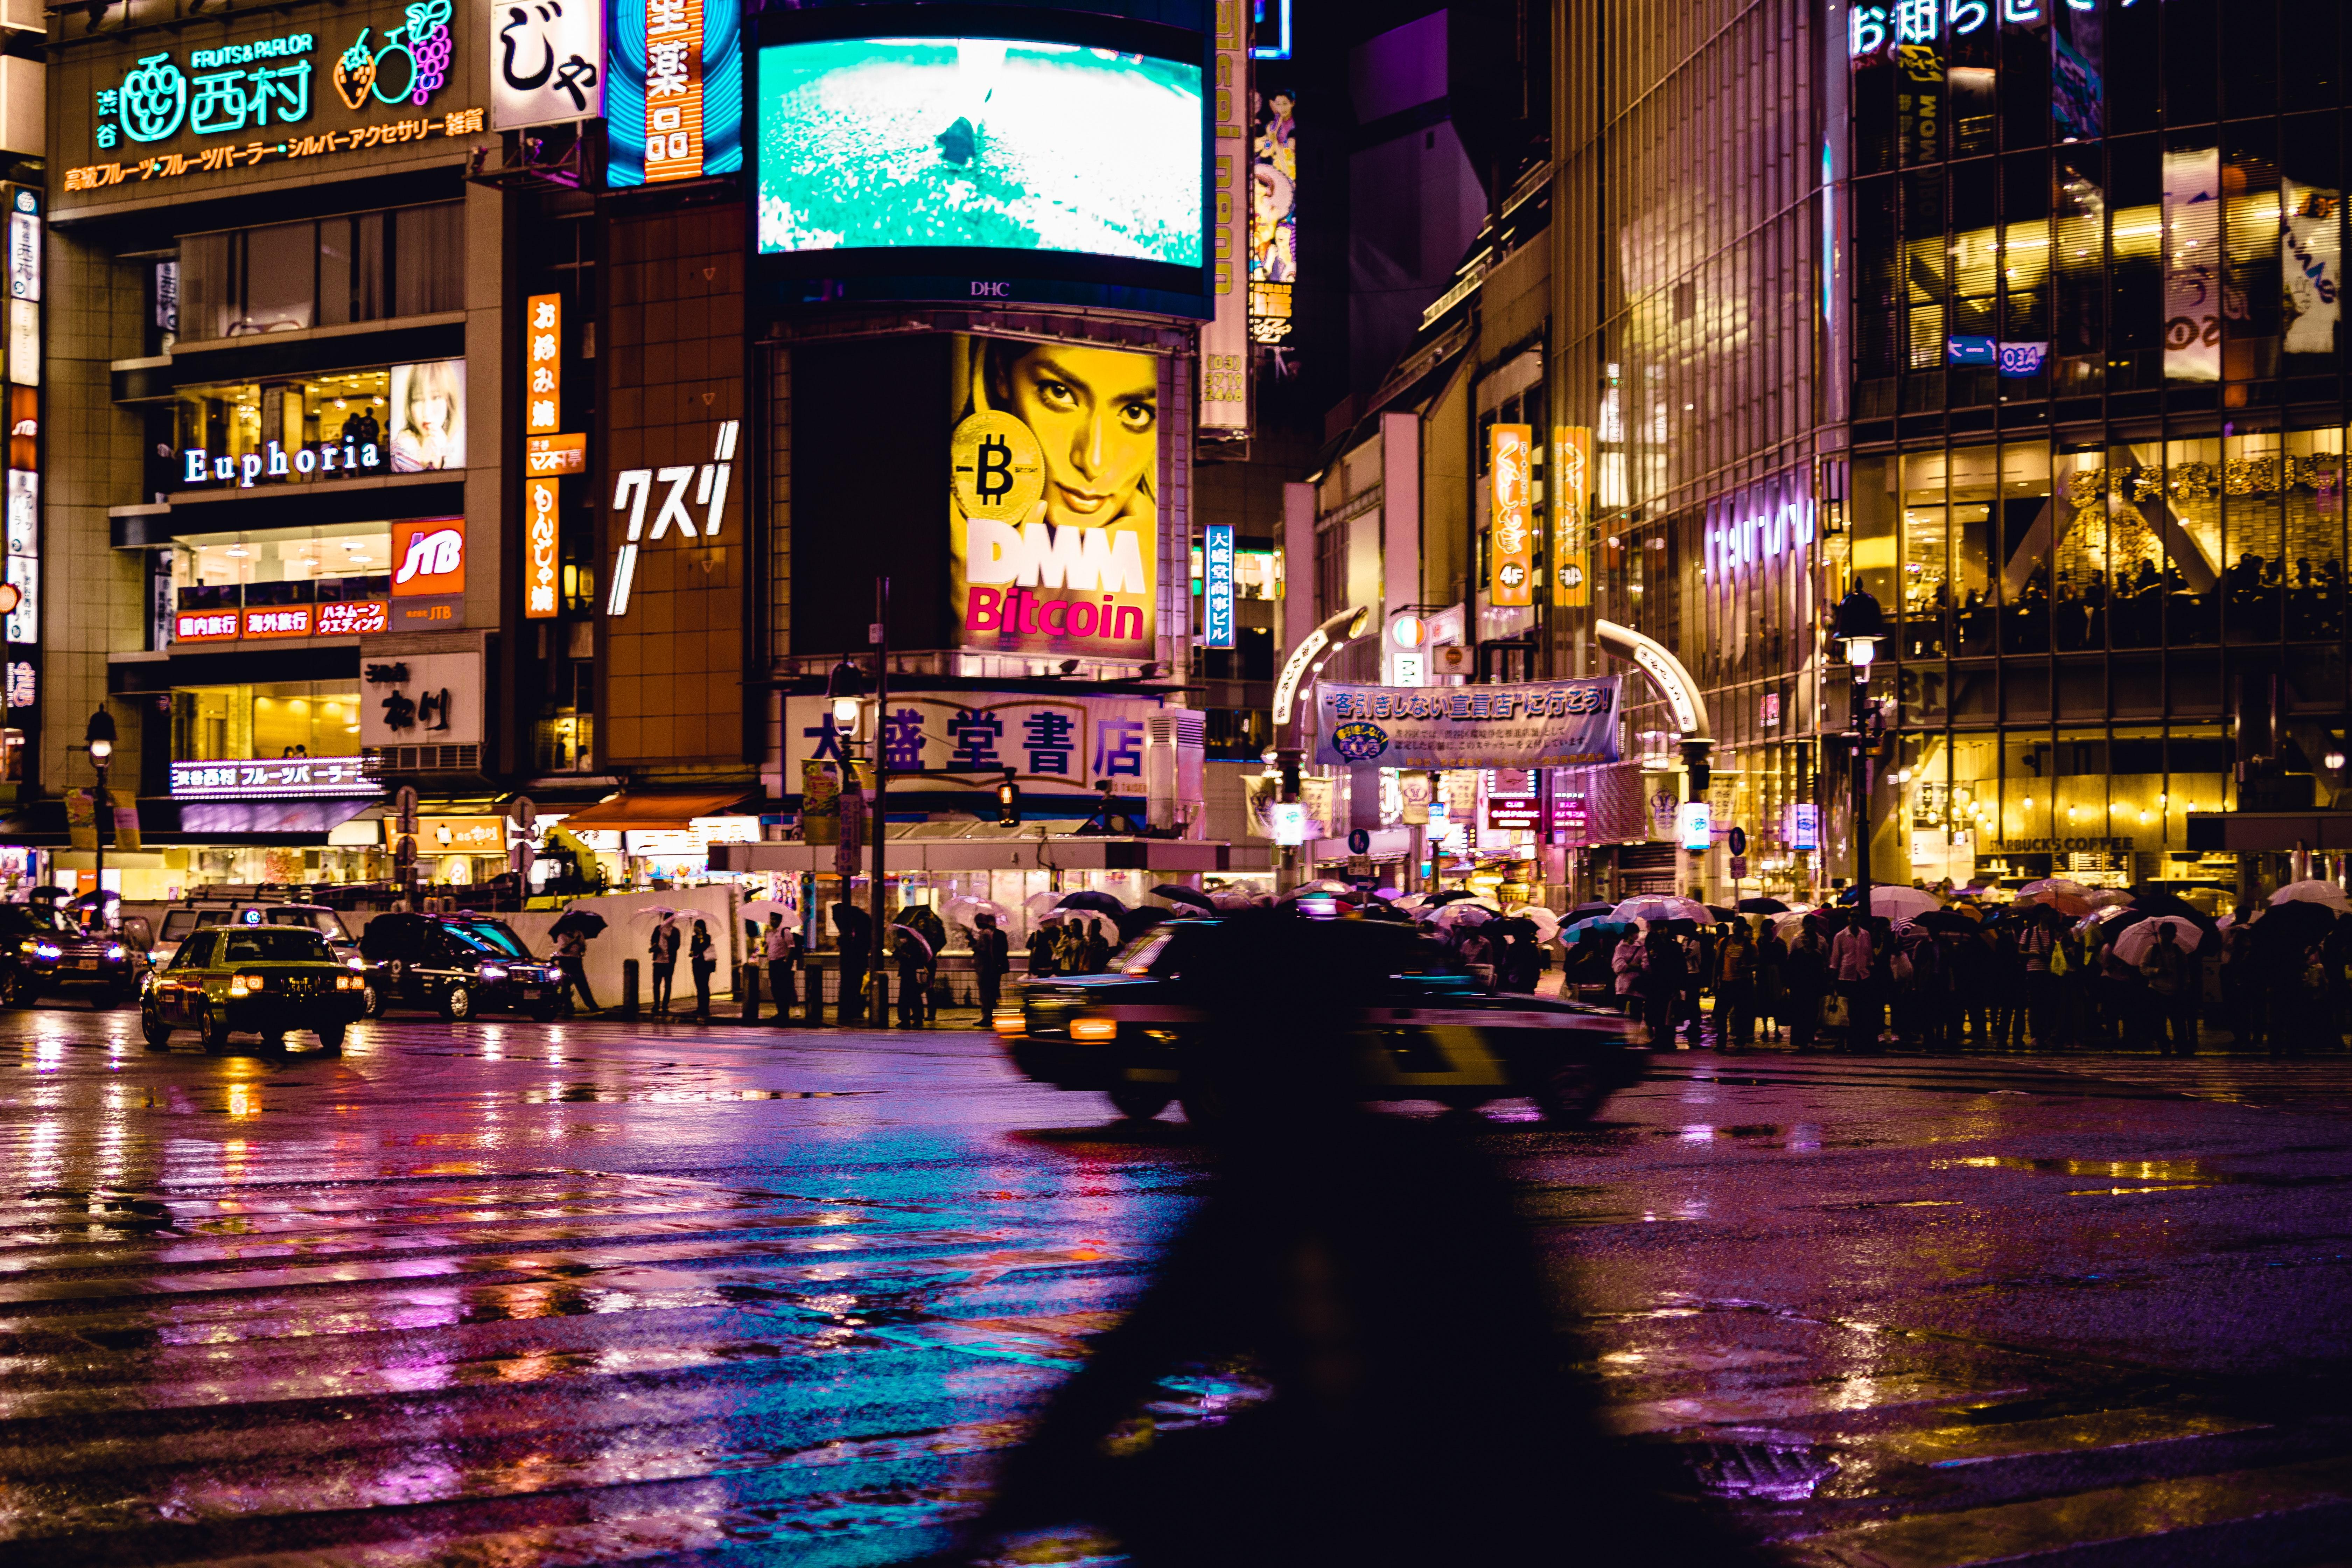 Use additional light in rain photoshoots